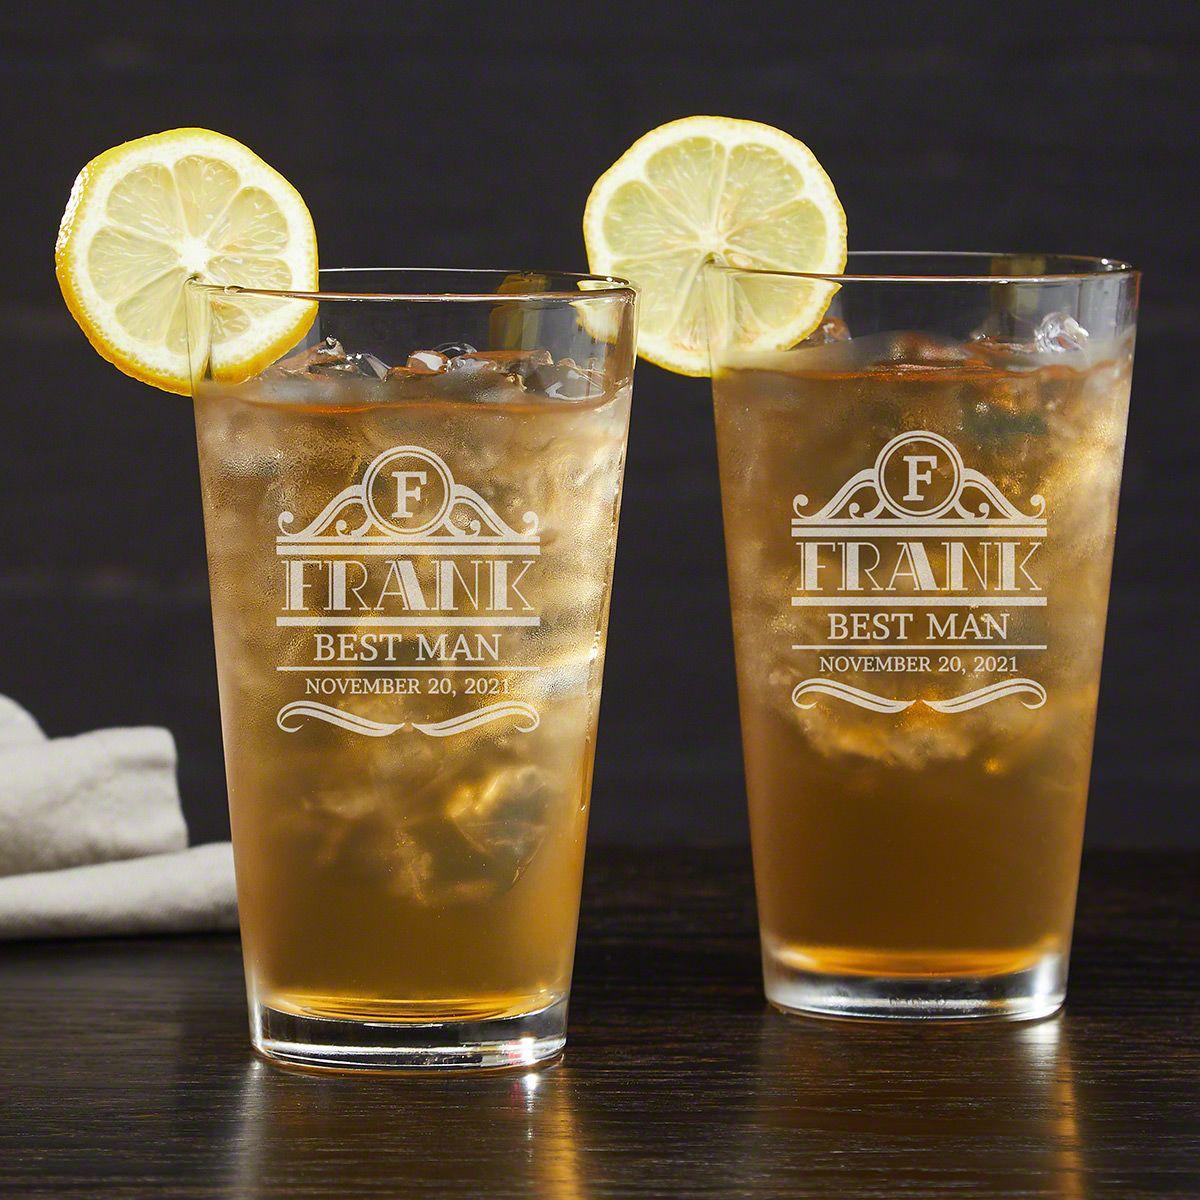 Rockefeller Personalized Long Island Iced Tea Glasses - Set of 2